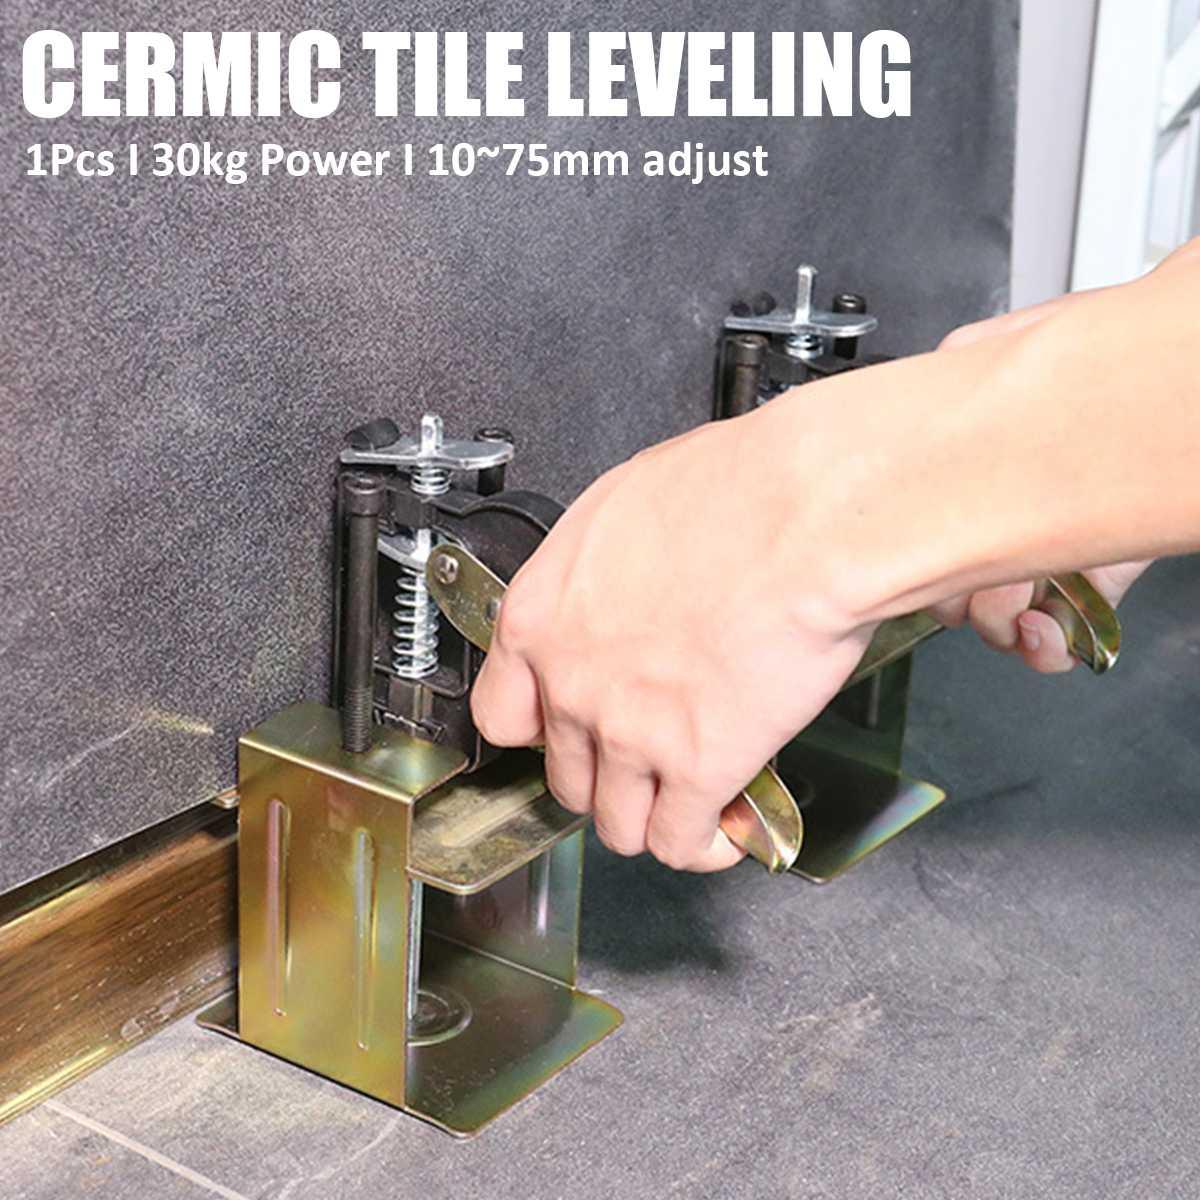 Adjustable Lifting Regulator Reinforced Tile Locator Construction Tools Wall Tile Leveling Positioner Locator For Floor Leveling